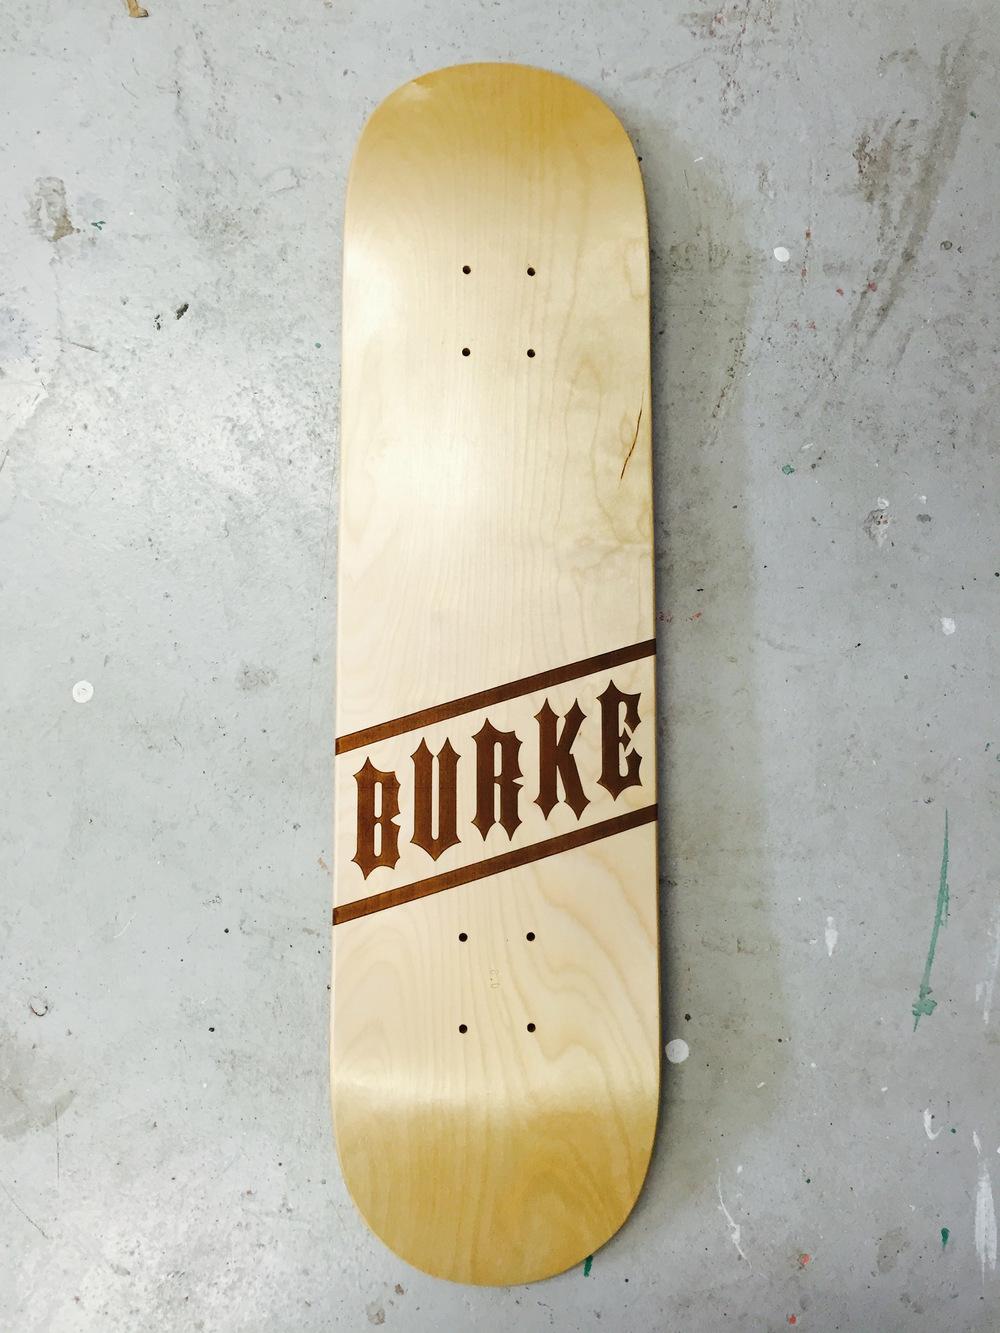 MARY BURKE - PRODUCER